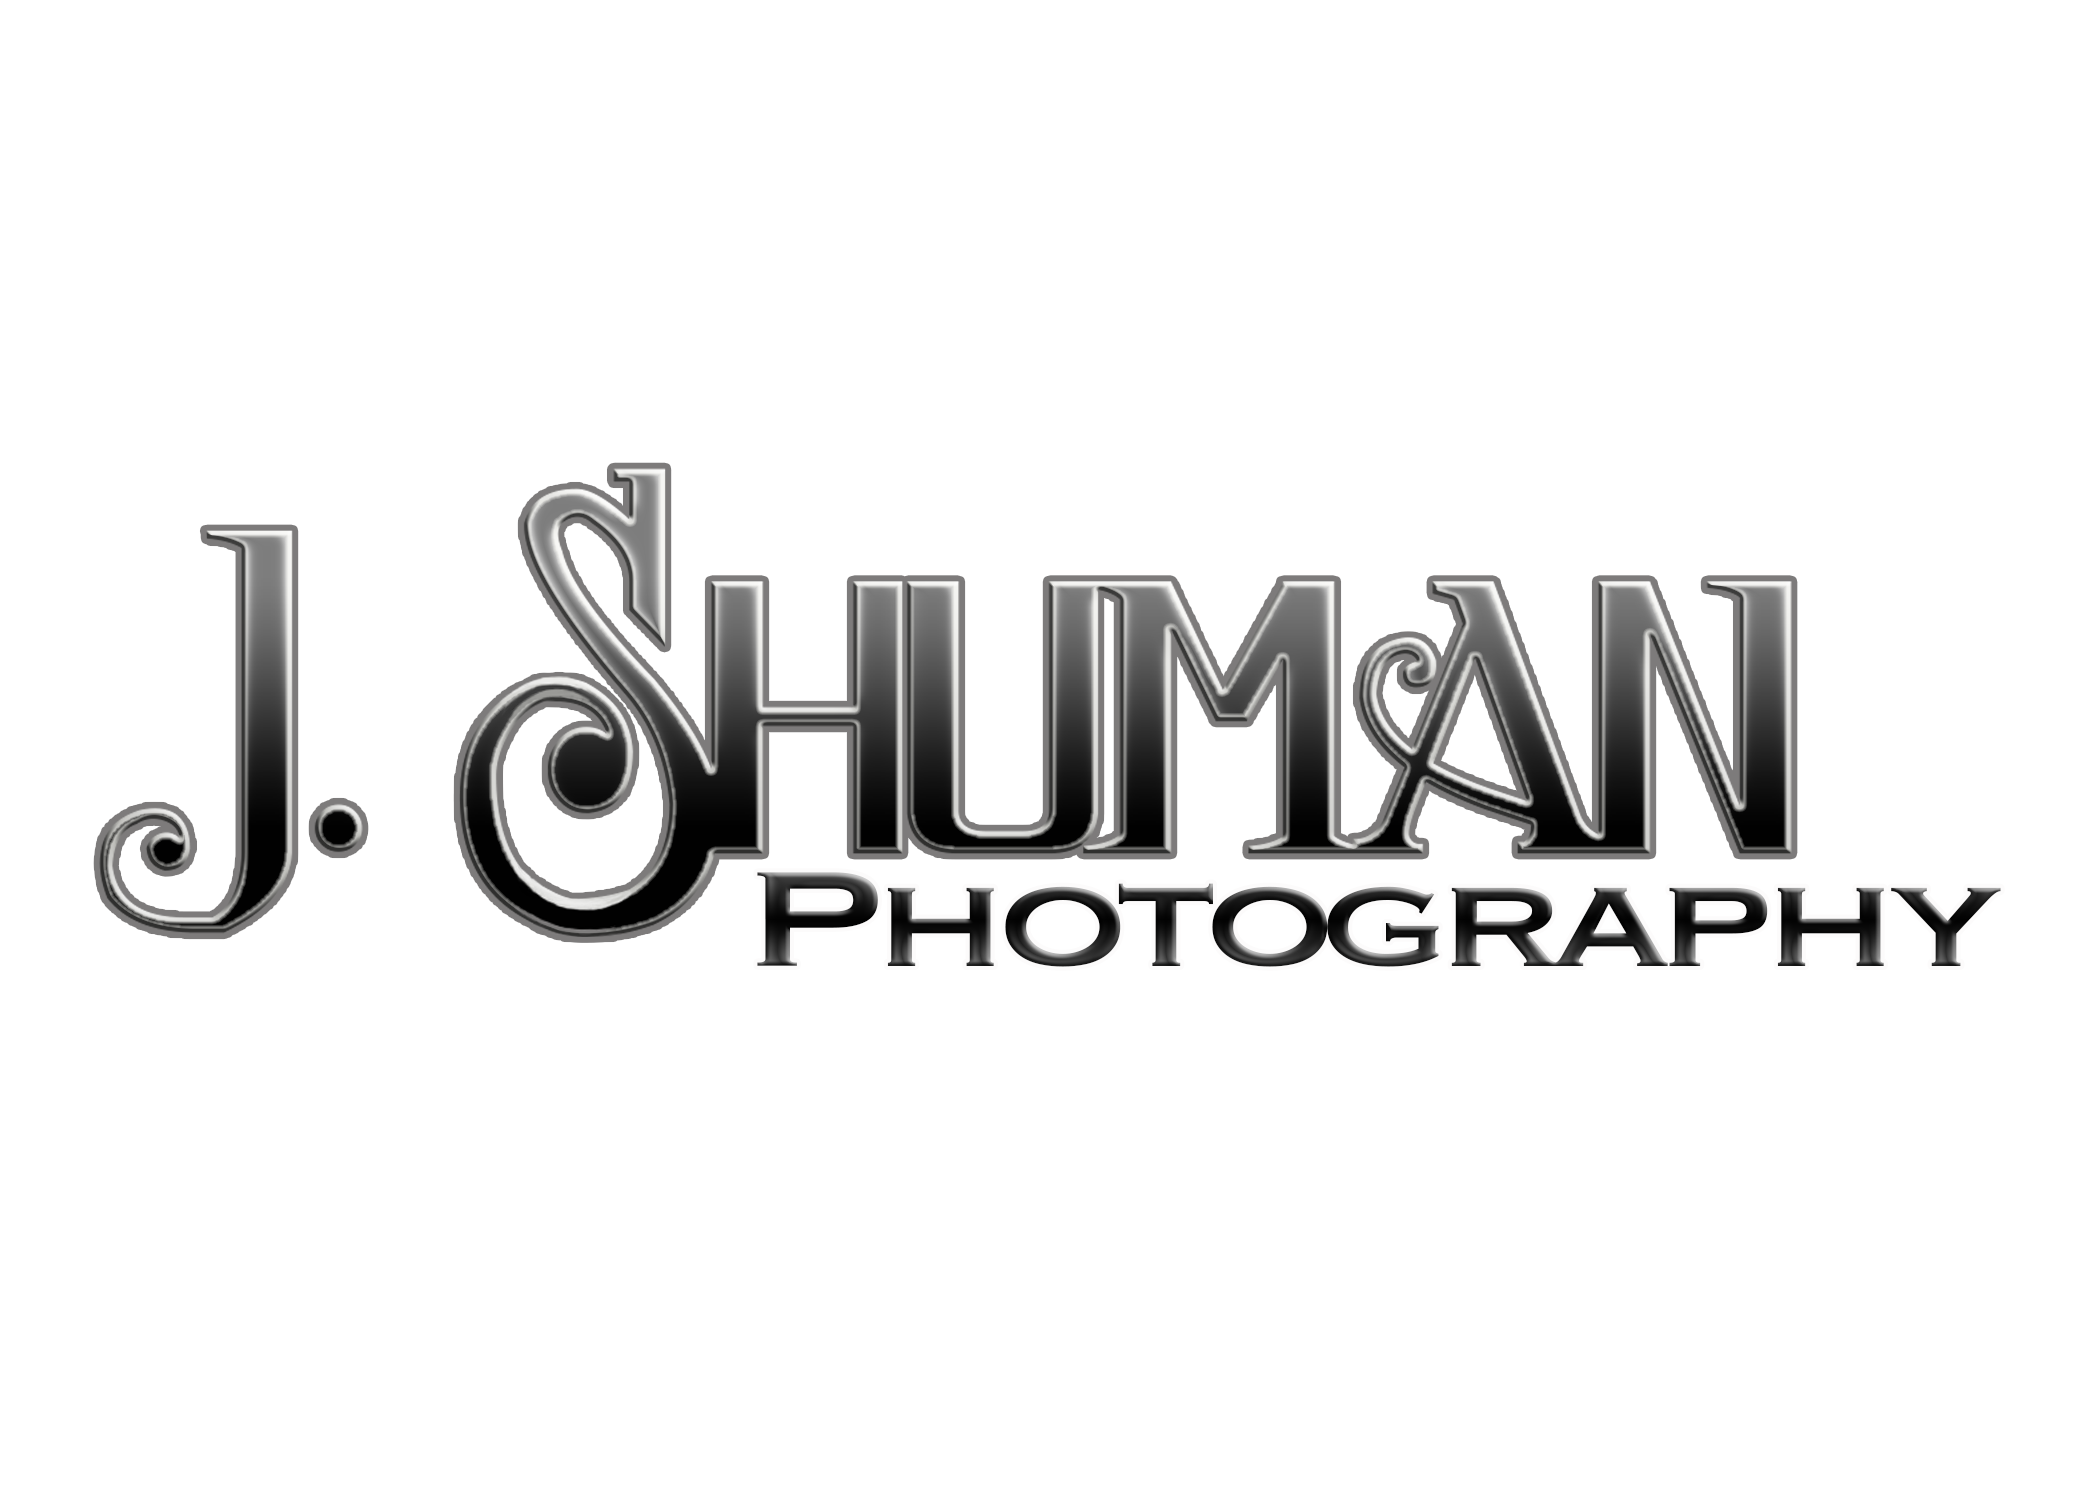 J. Shuman Photography 2018